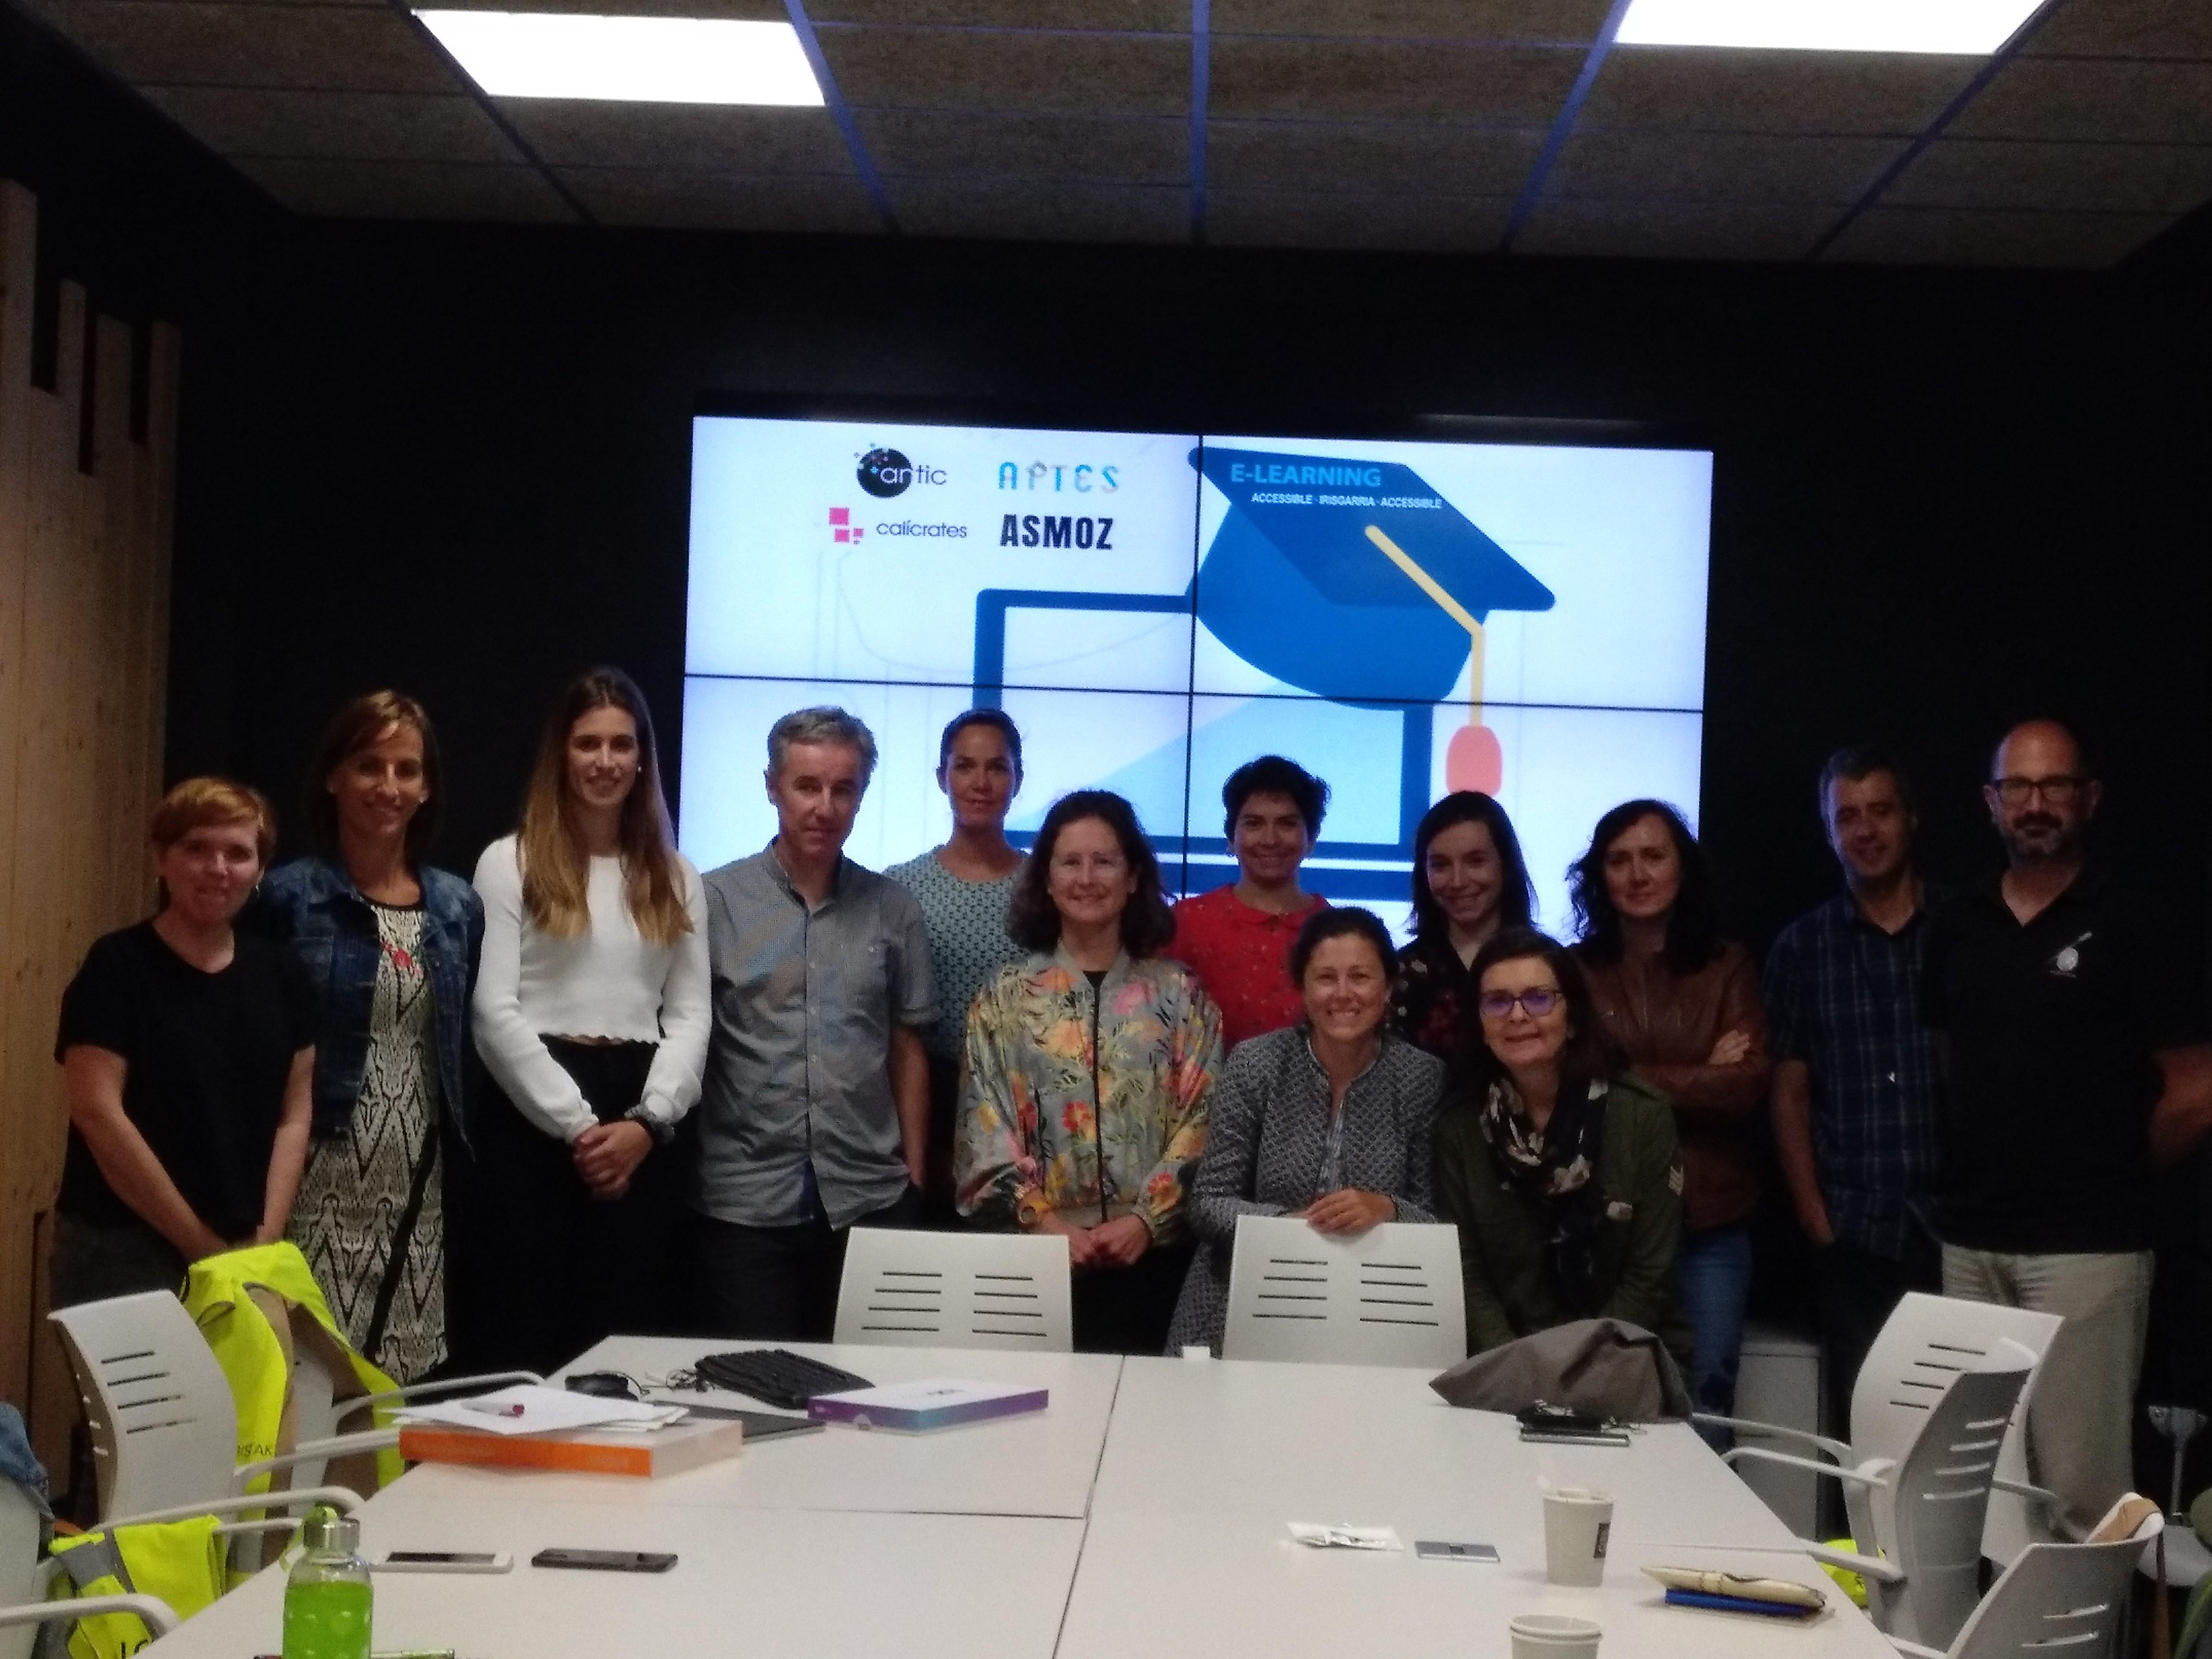 Foto de grupo de la jornada sobre ELearning Accesible